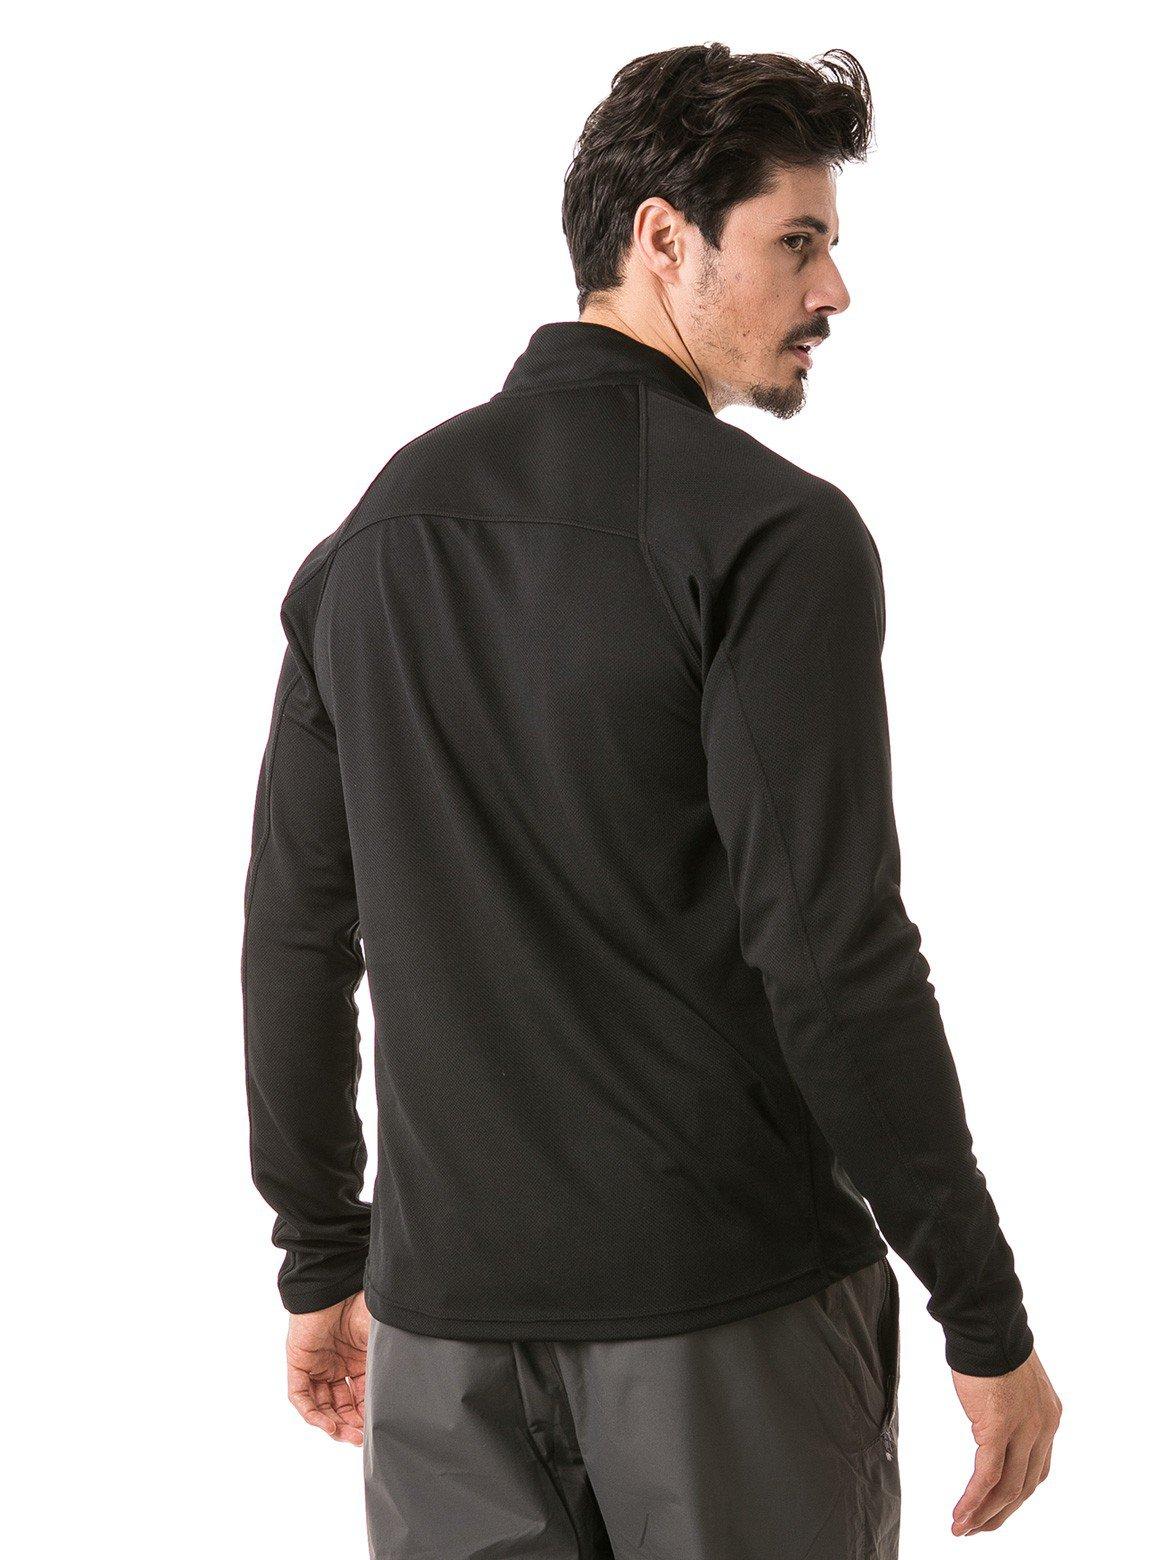 camisa masculina raglan gola alta longa dry preta costas b